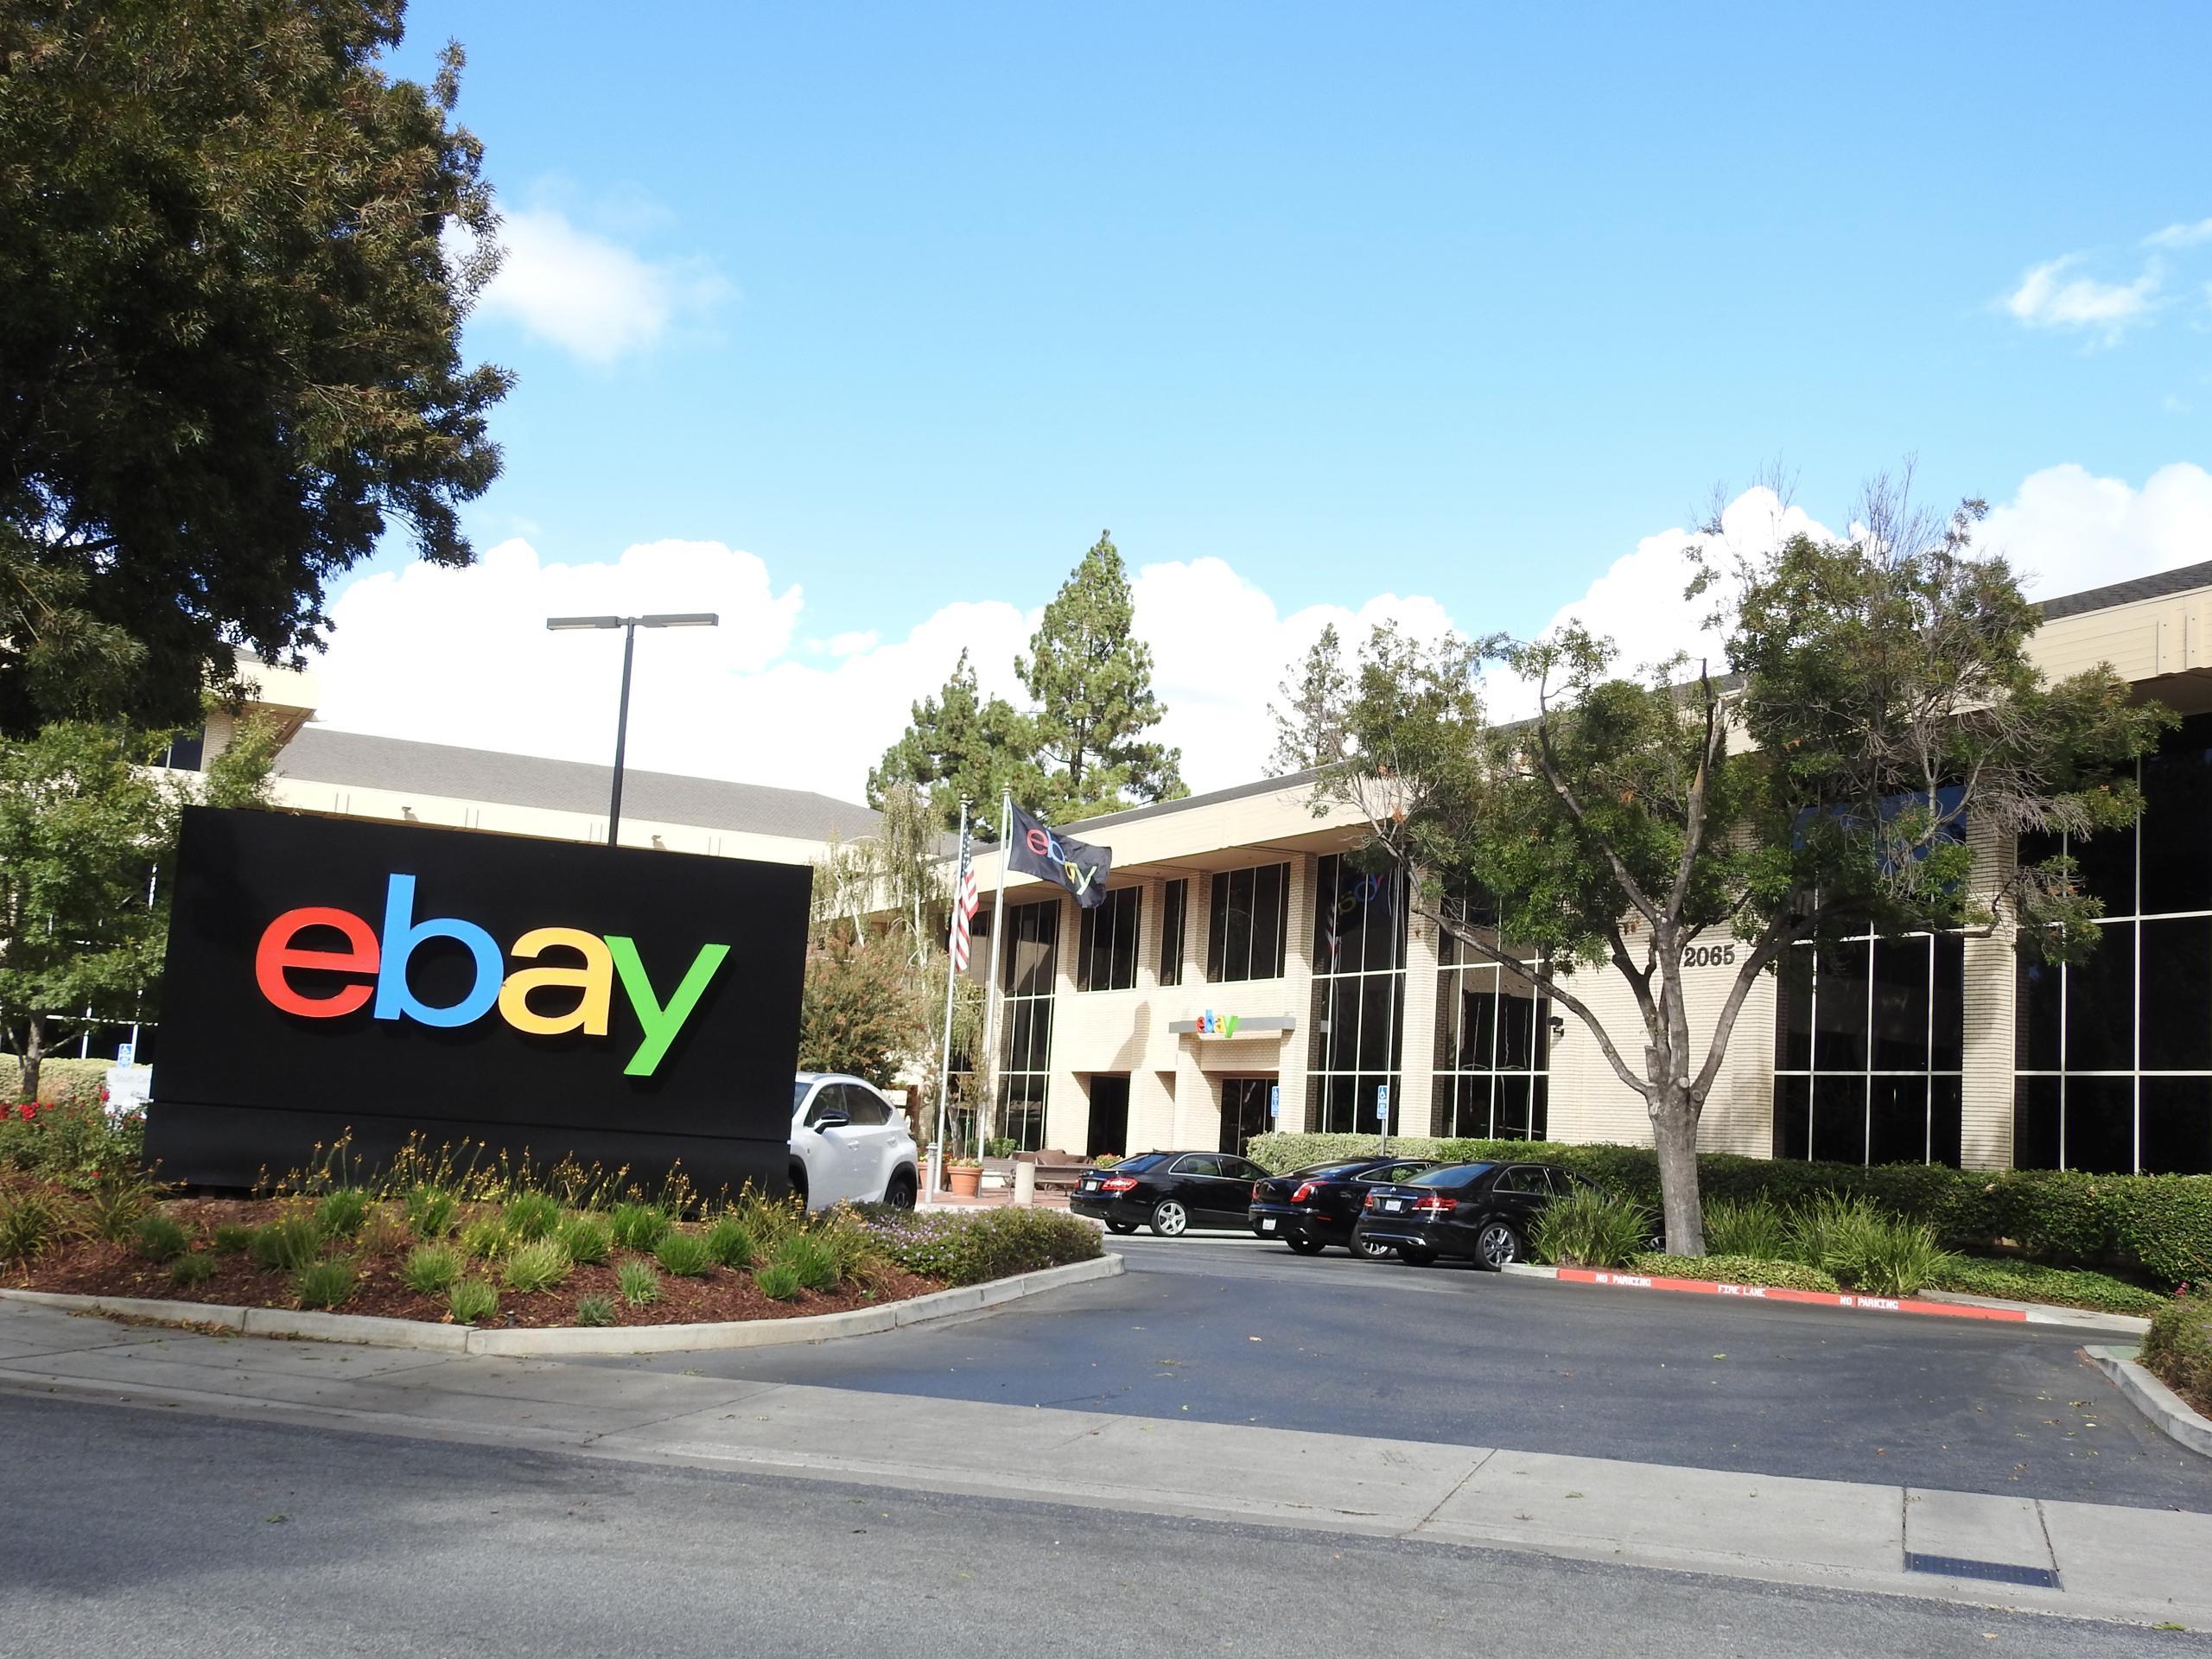 eBay's corporate headquarters in San Jose, California.